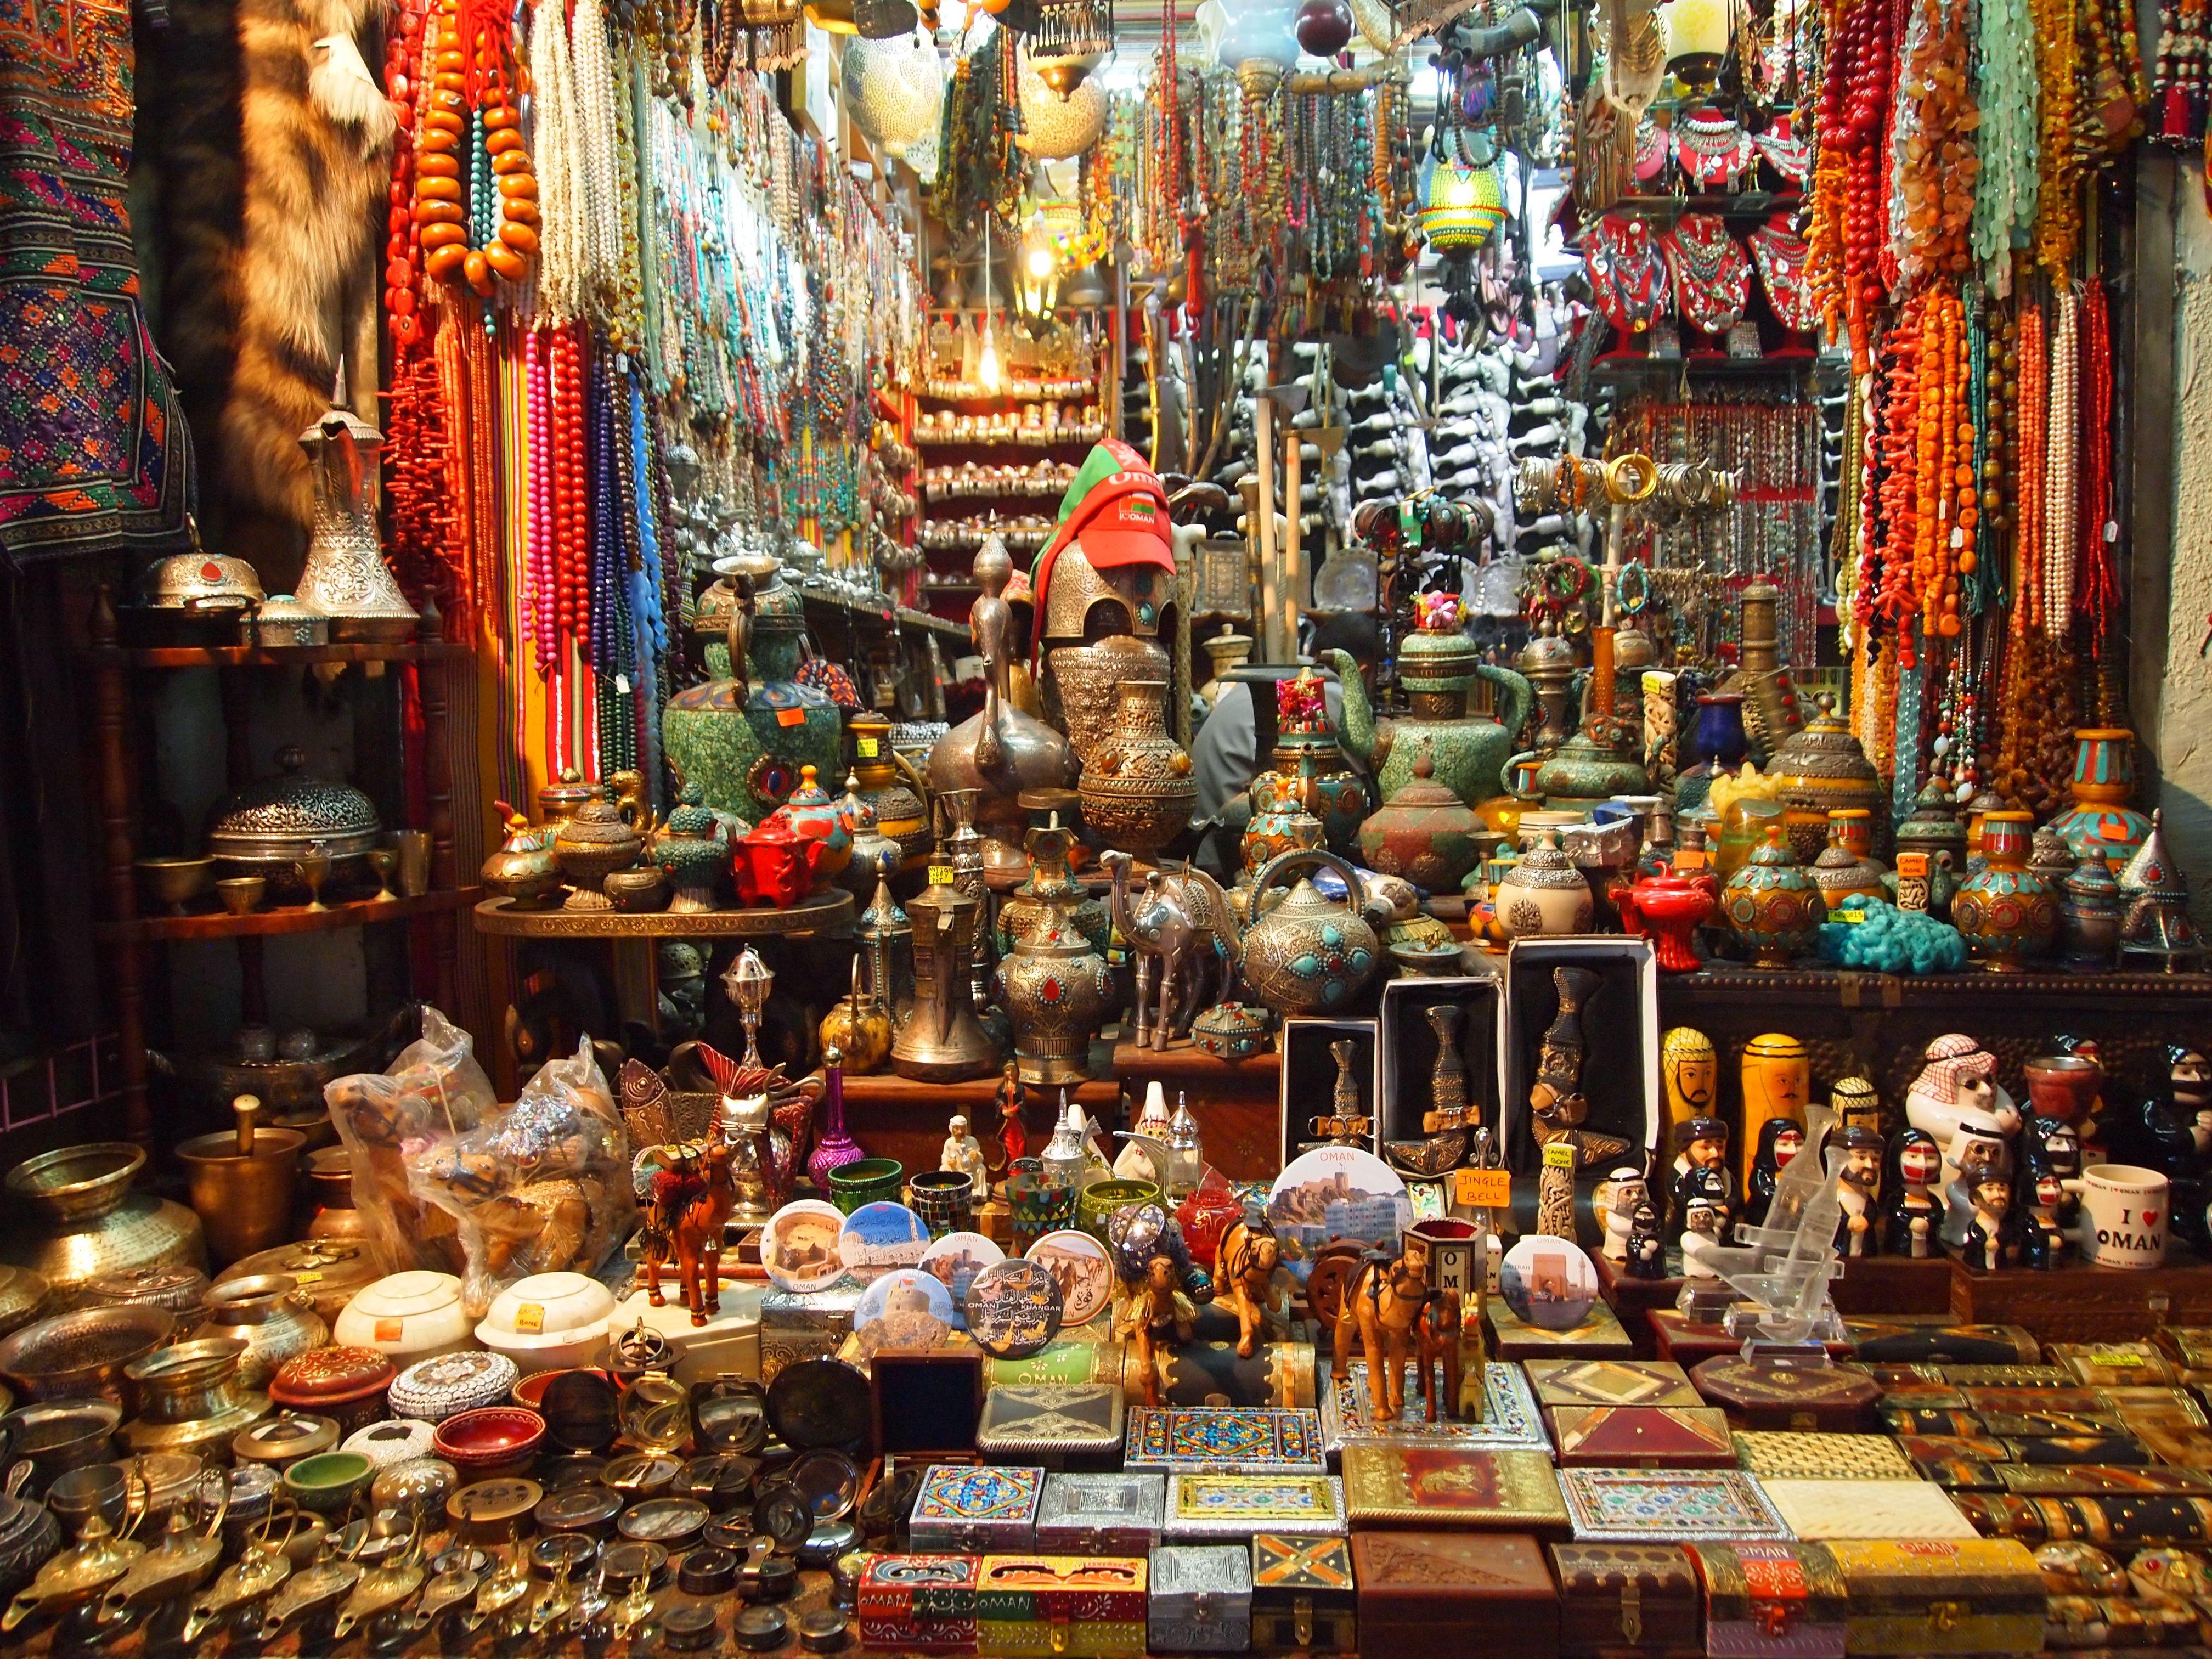 بازار مسقط عمان